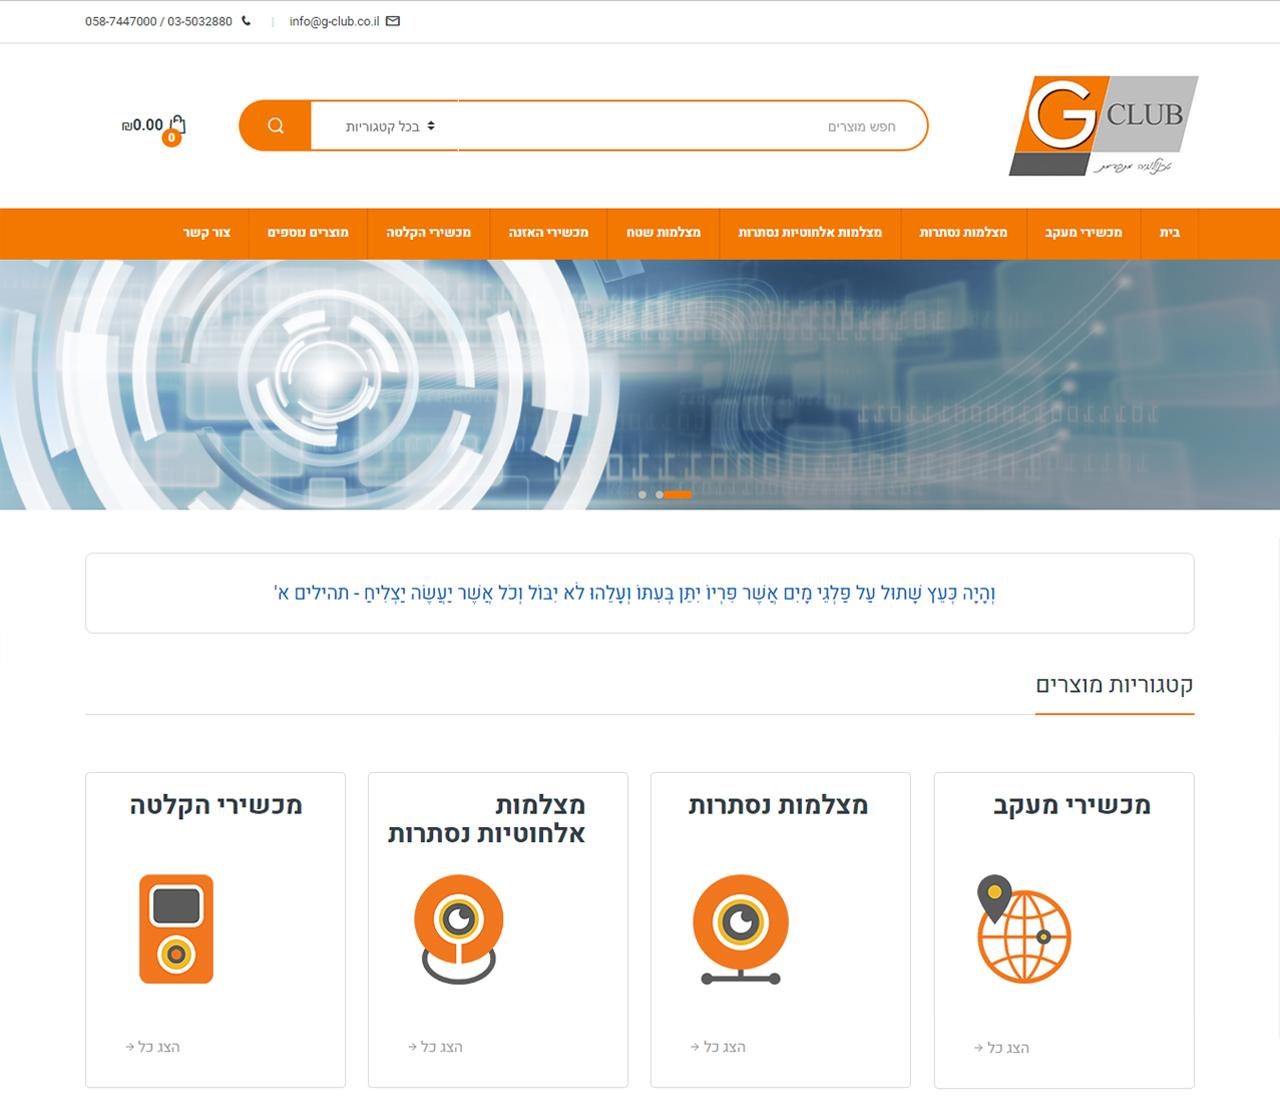 G-club.co.il — Создание интернет-магазина